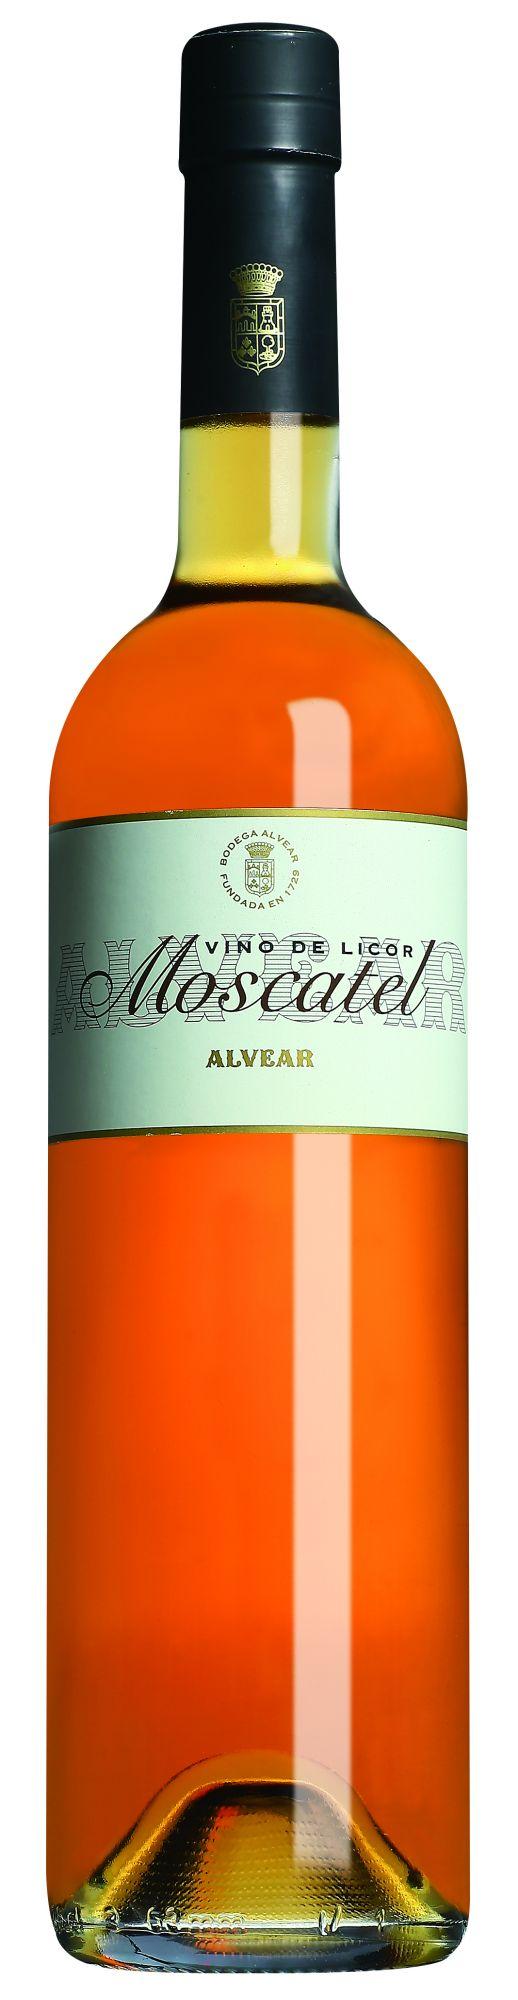 Alvear Moscatel